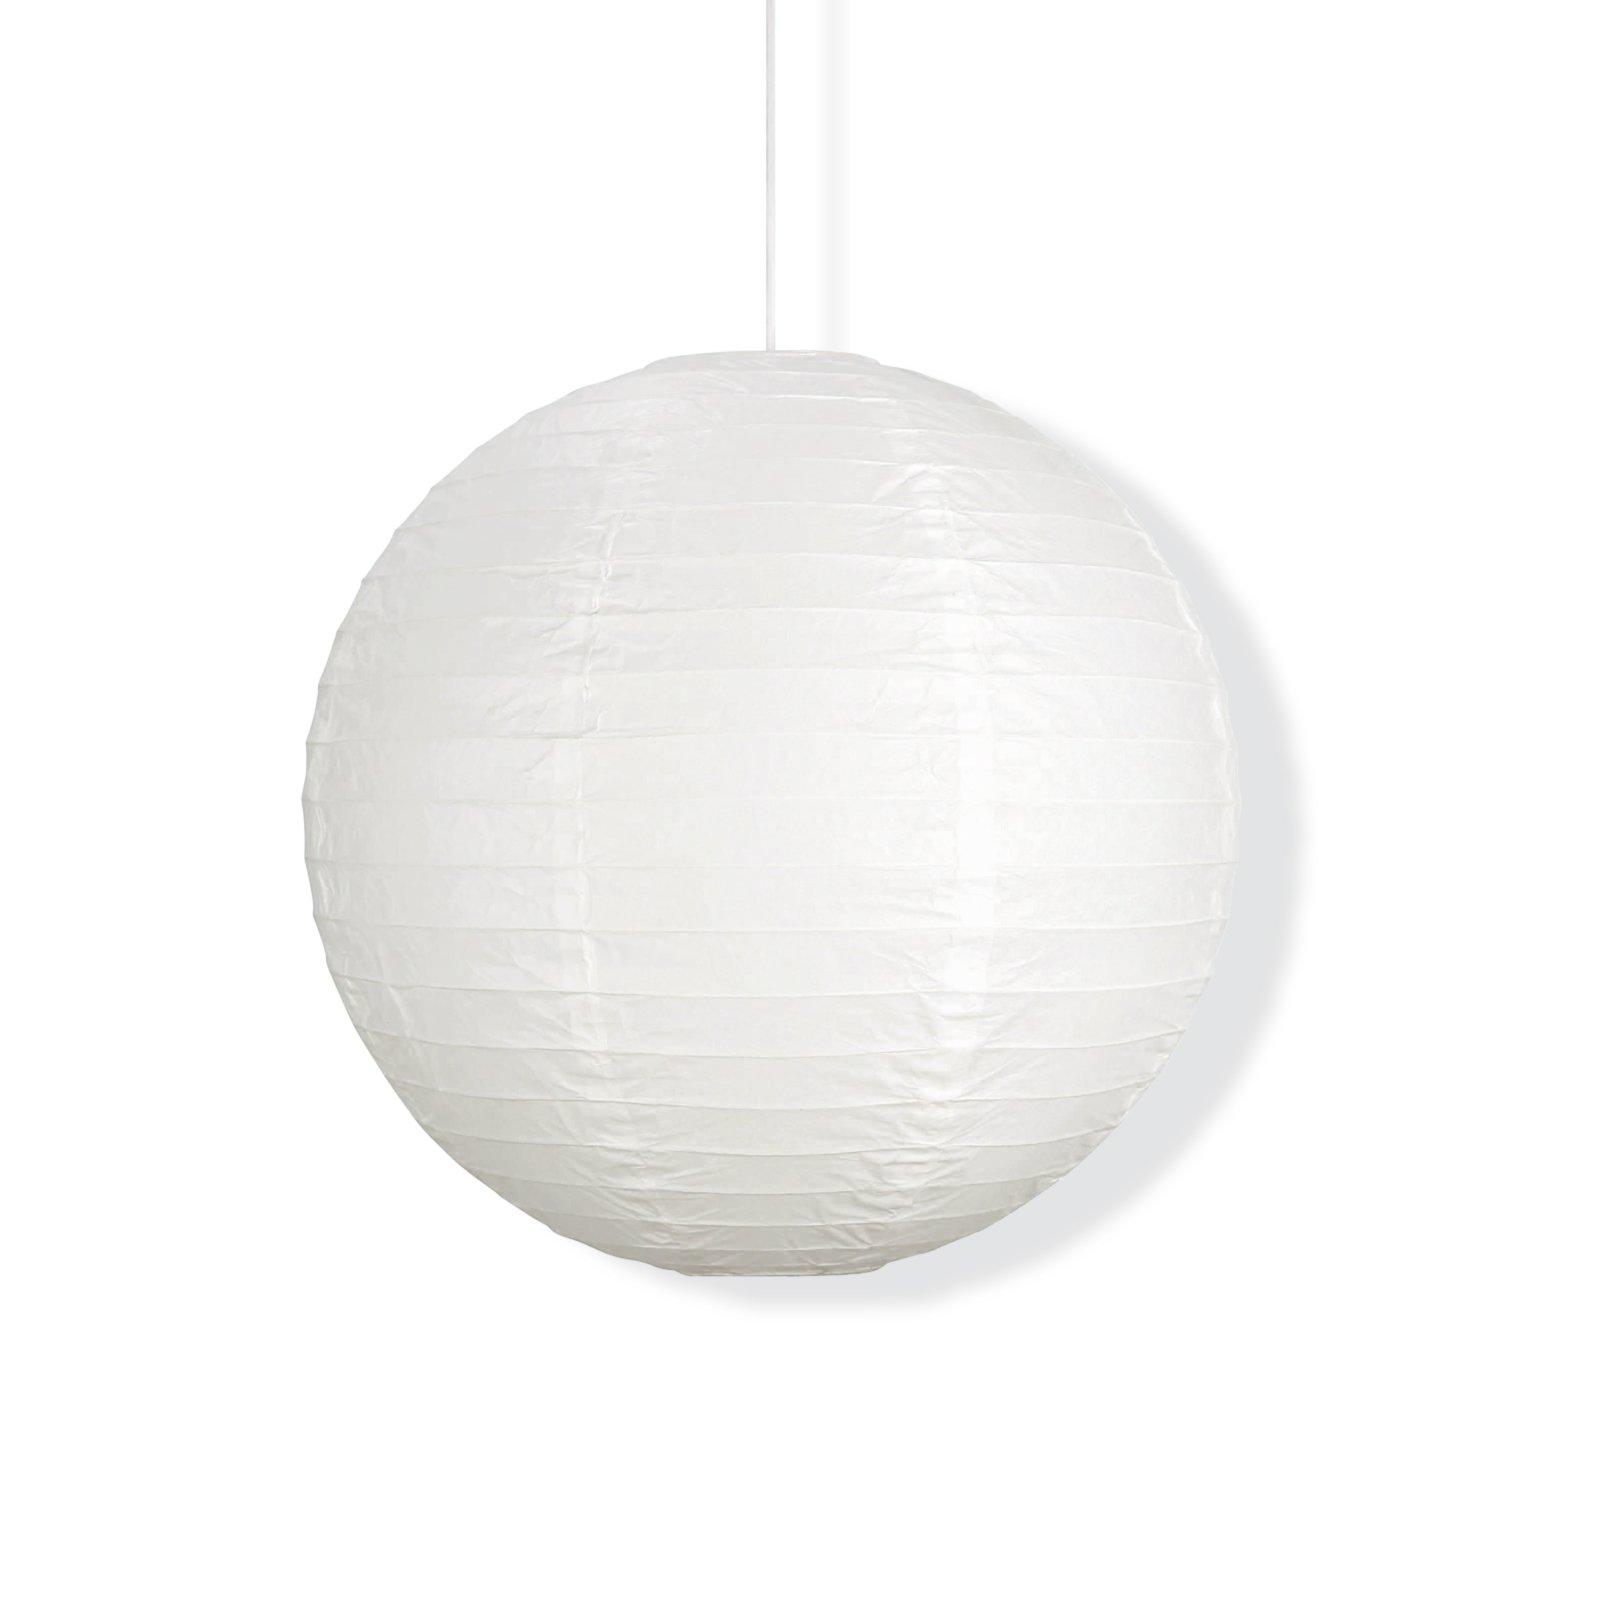 Ikea Lampenschirm Papier Regolit Abat Jour Suspension